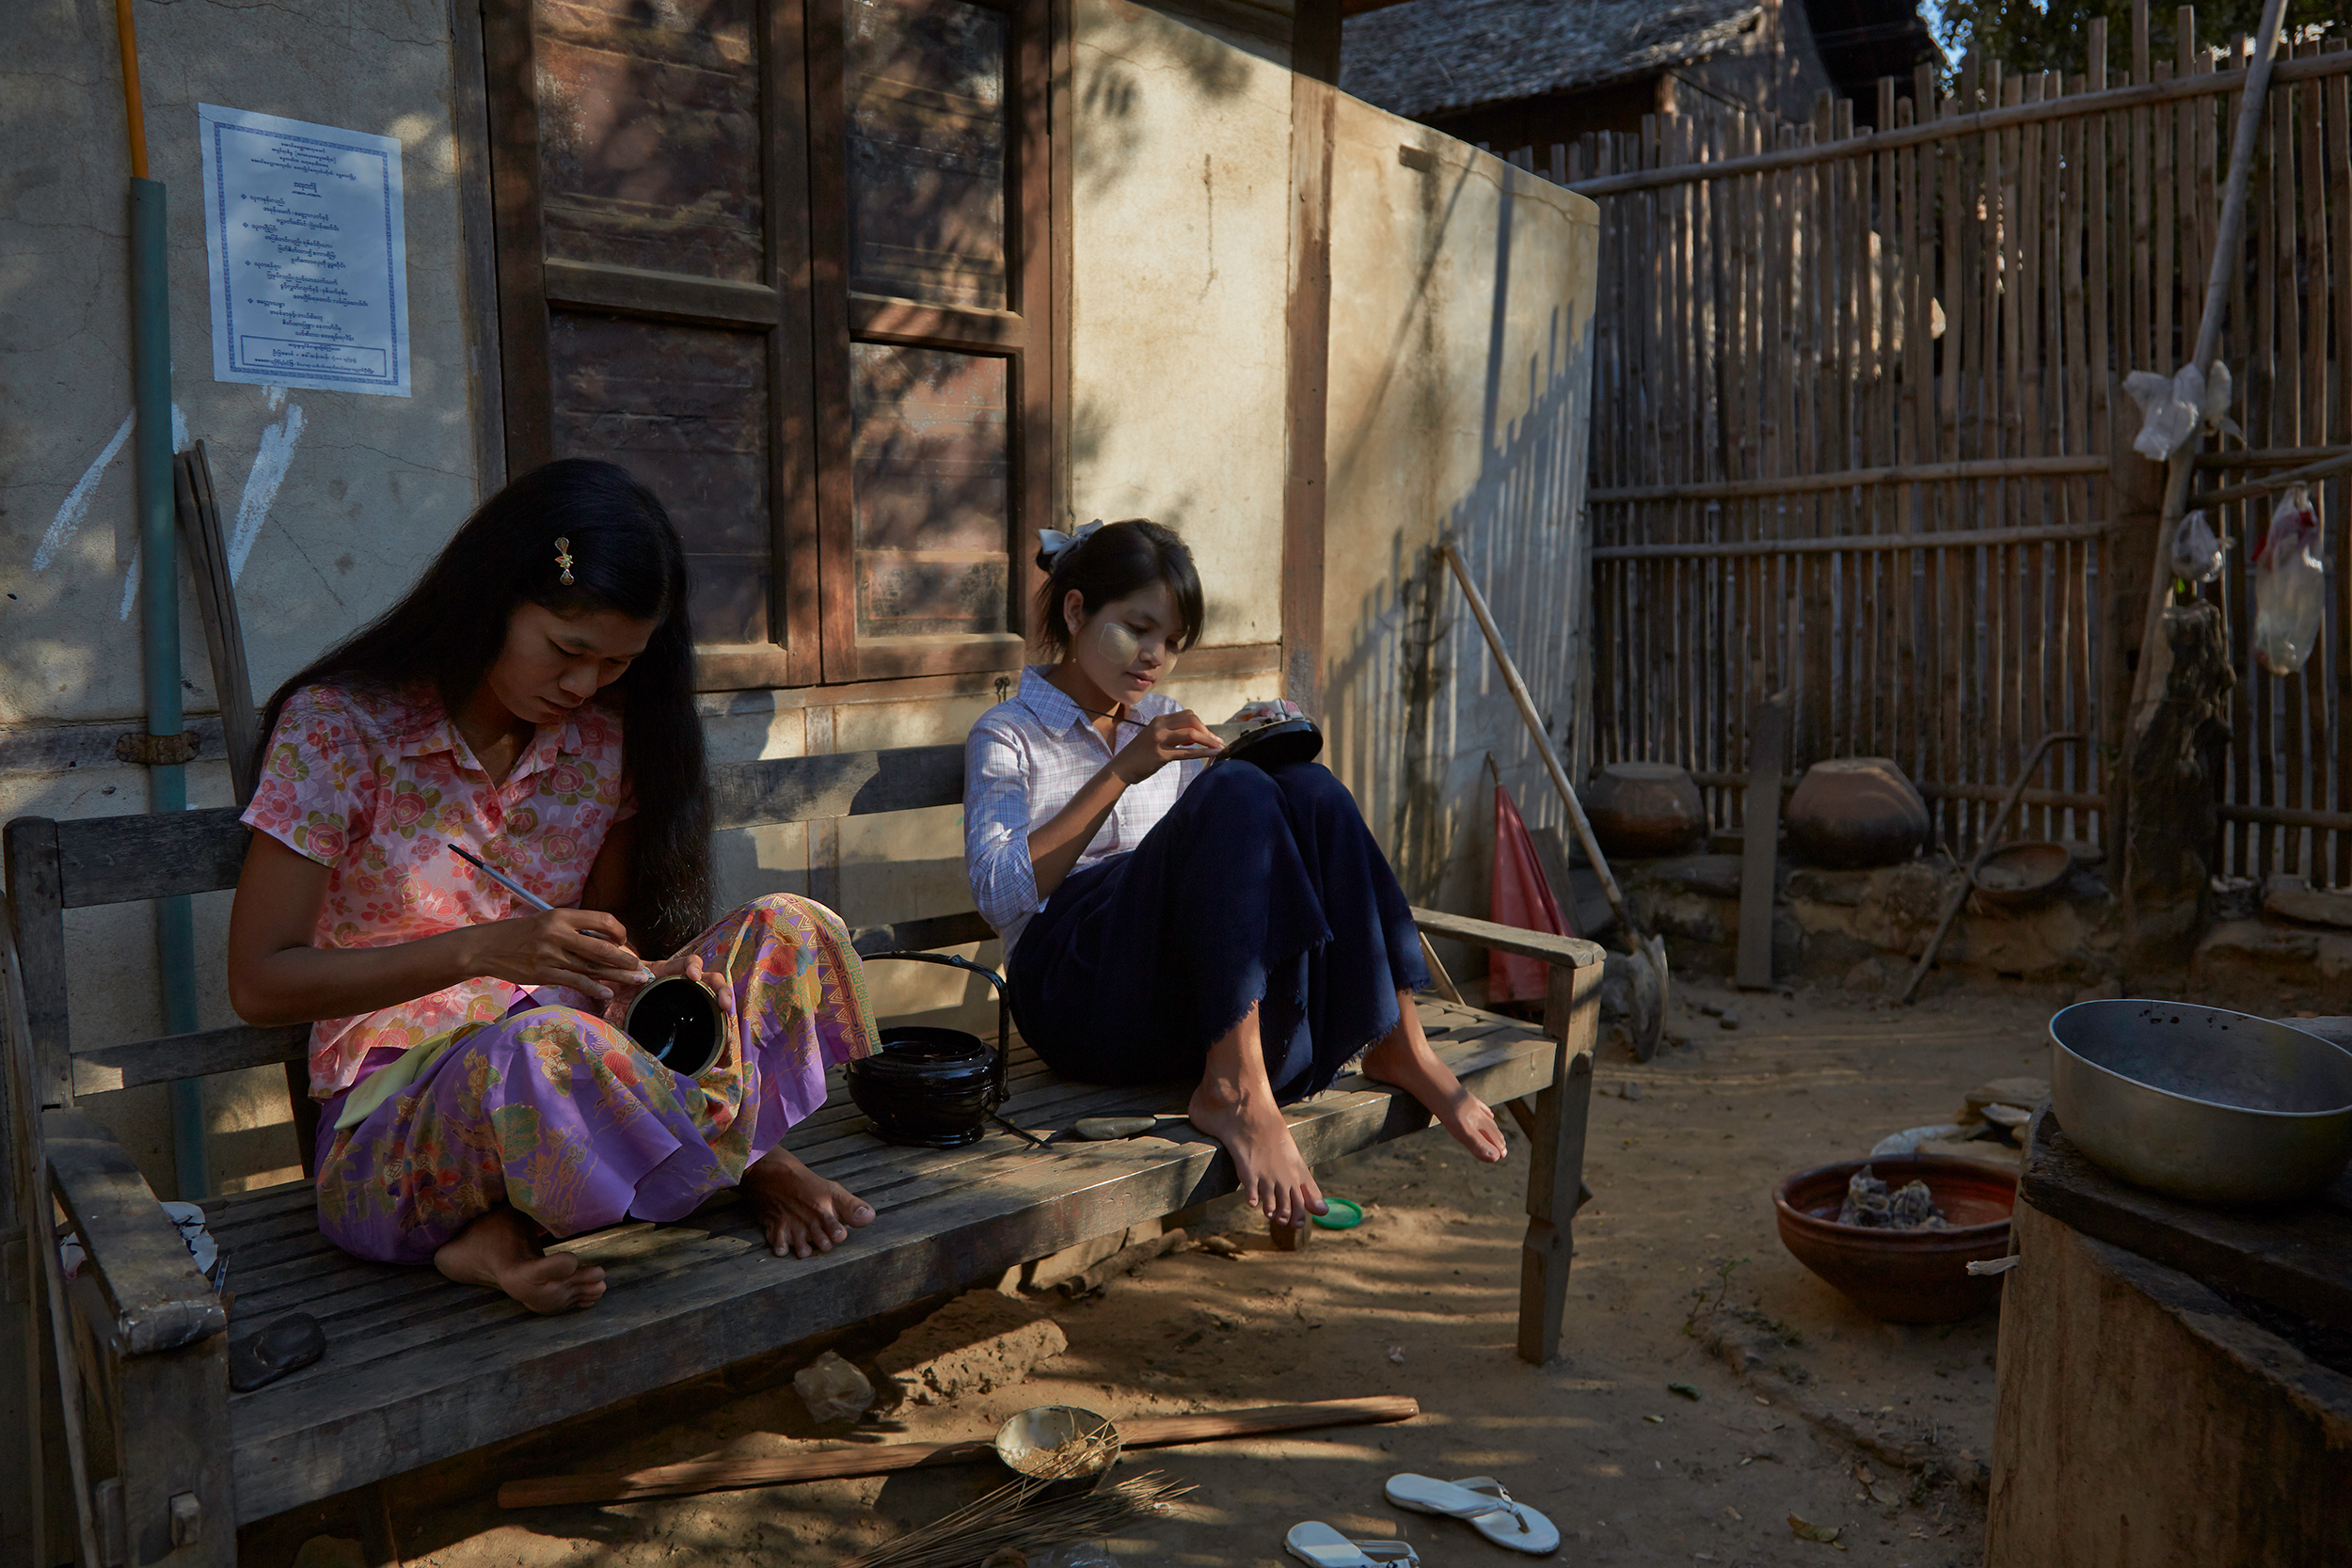 Kanjana-Chaiwatanachai-Image-Works_Bagan-PM_2014.01.16_0003w.jpg